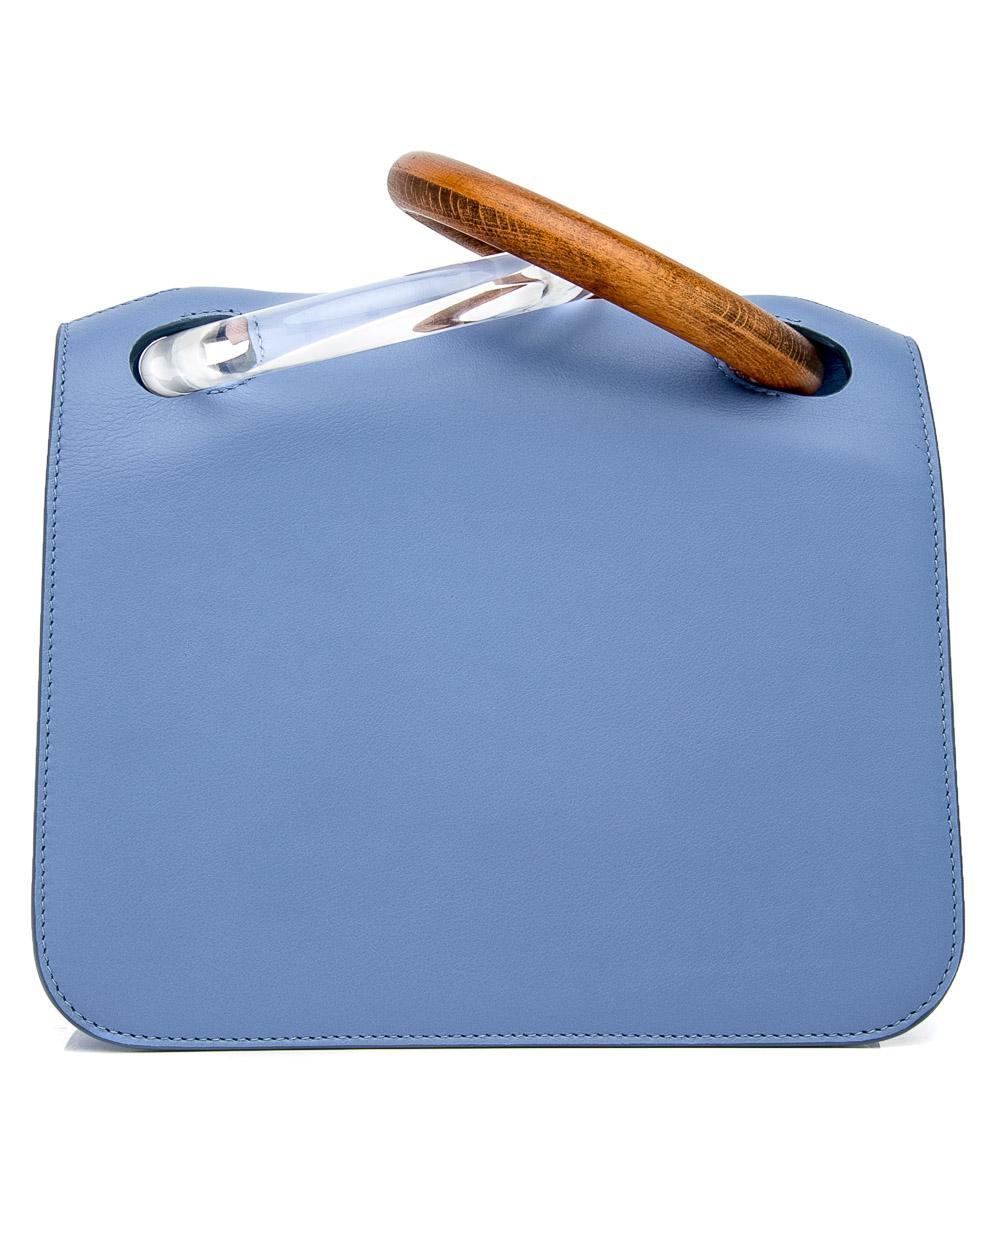 Neneh Leather Bag Roksanda Ilincic 62Md4Yfgd